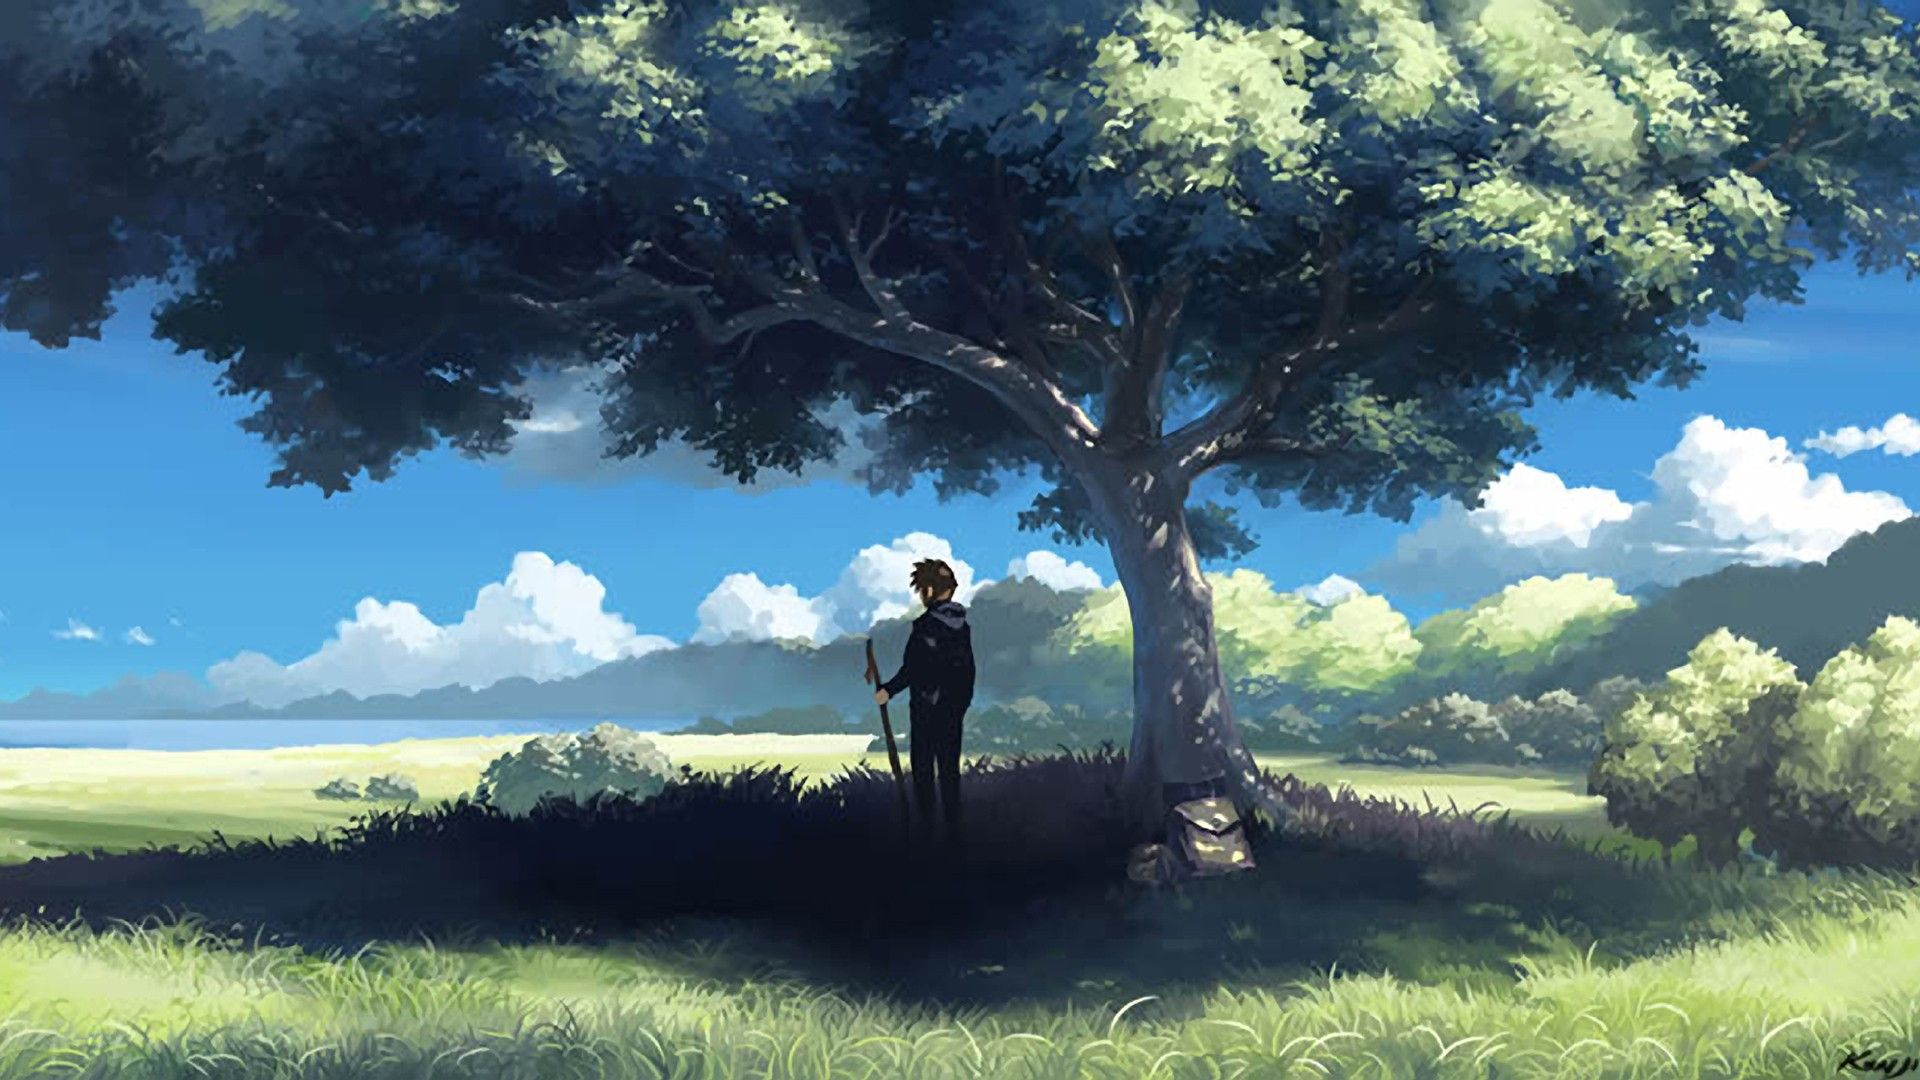 Yt Anime Scenery Anime Scenery Wallpaper Scenery Wallpaper Anime nature wallpaper hd